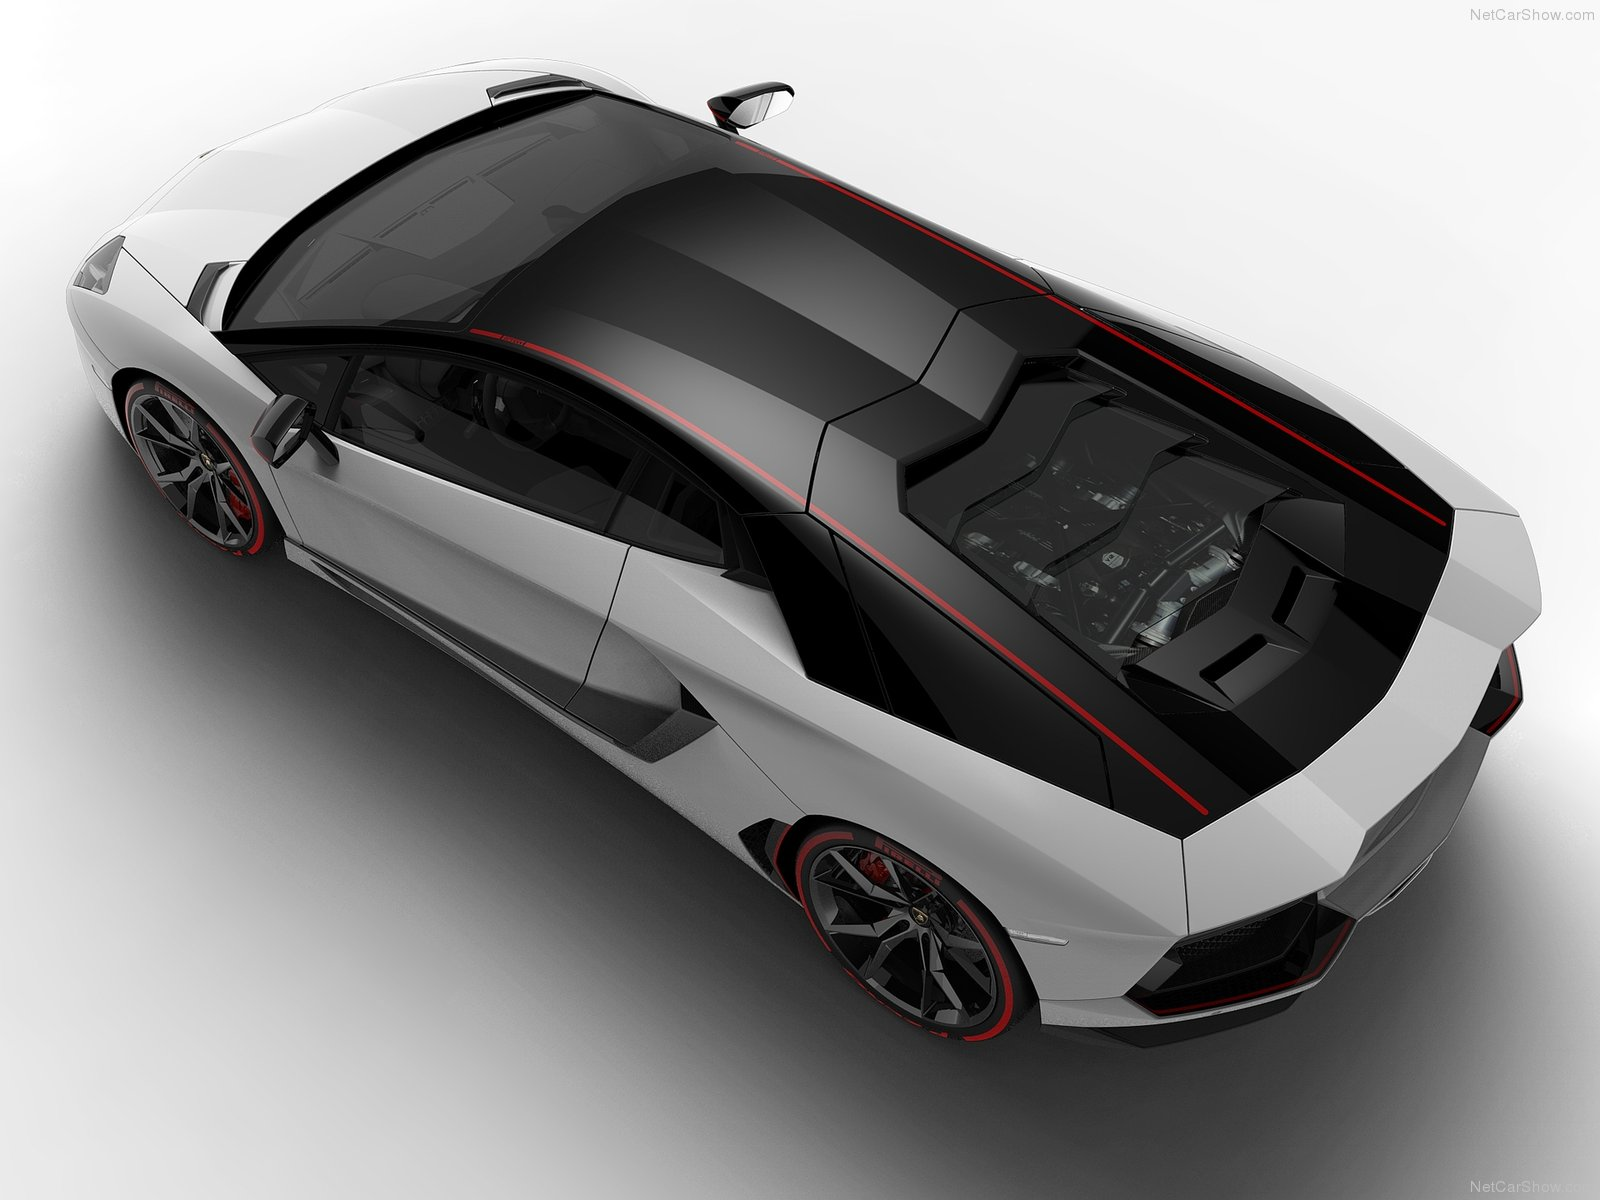 Hình ảnh siêu xe Lamborghini Aventador LP700-4 Pirelli Edition 2015 & nội ngoại thất